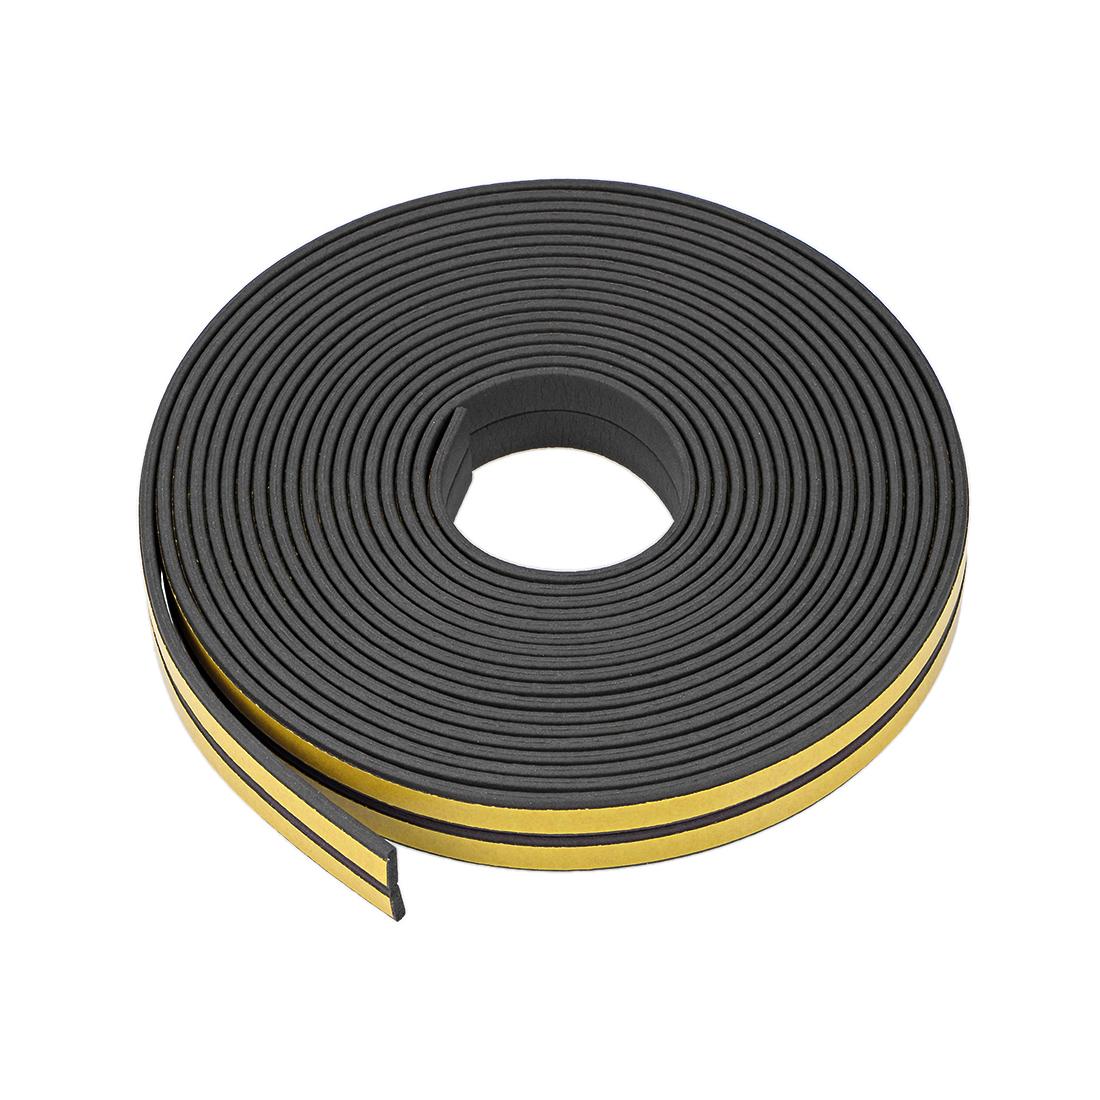 Foam Tape Adhesive 9mm Wide 2mm Thick, Total 32.8 Feet Black 2Pcs